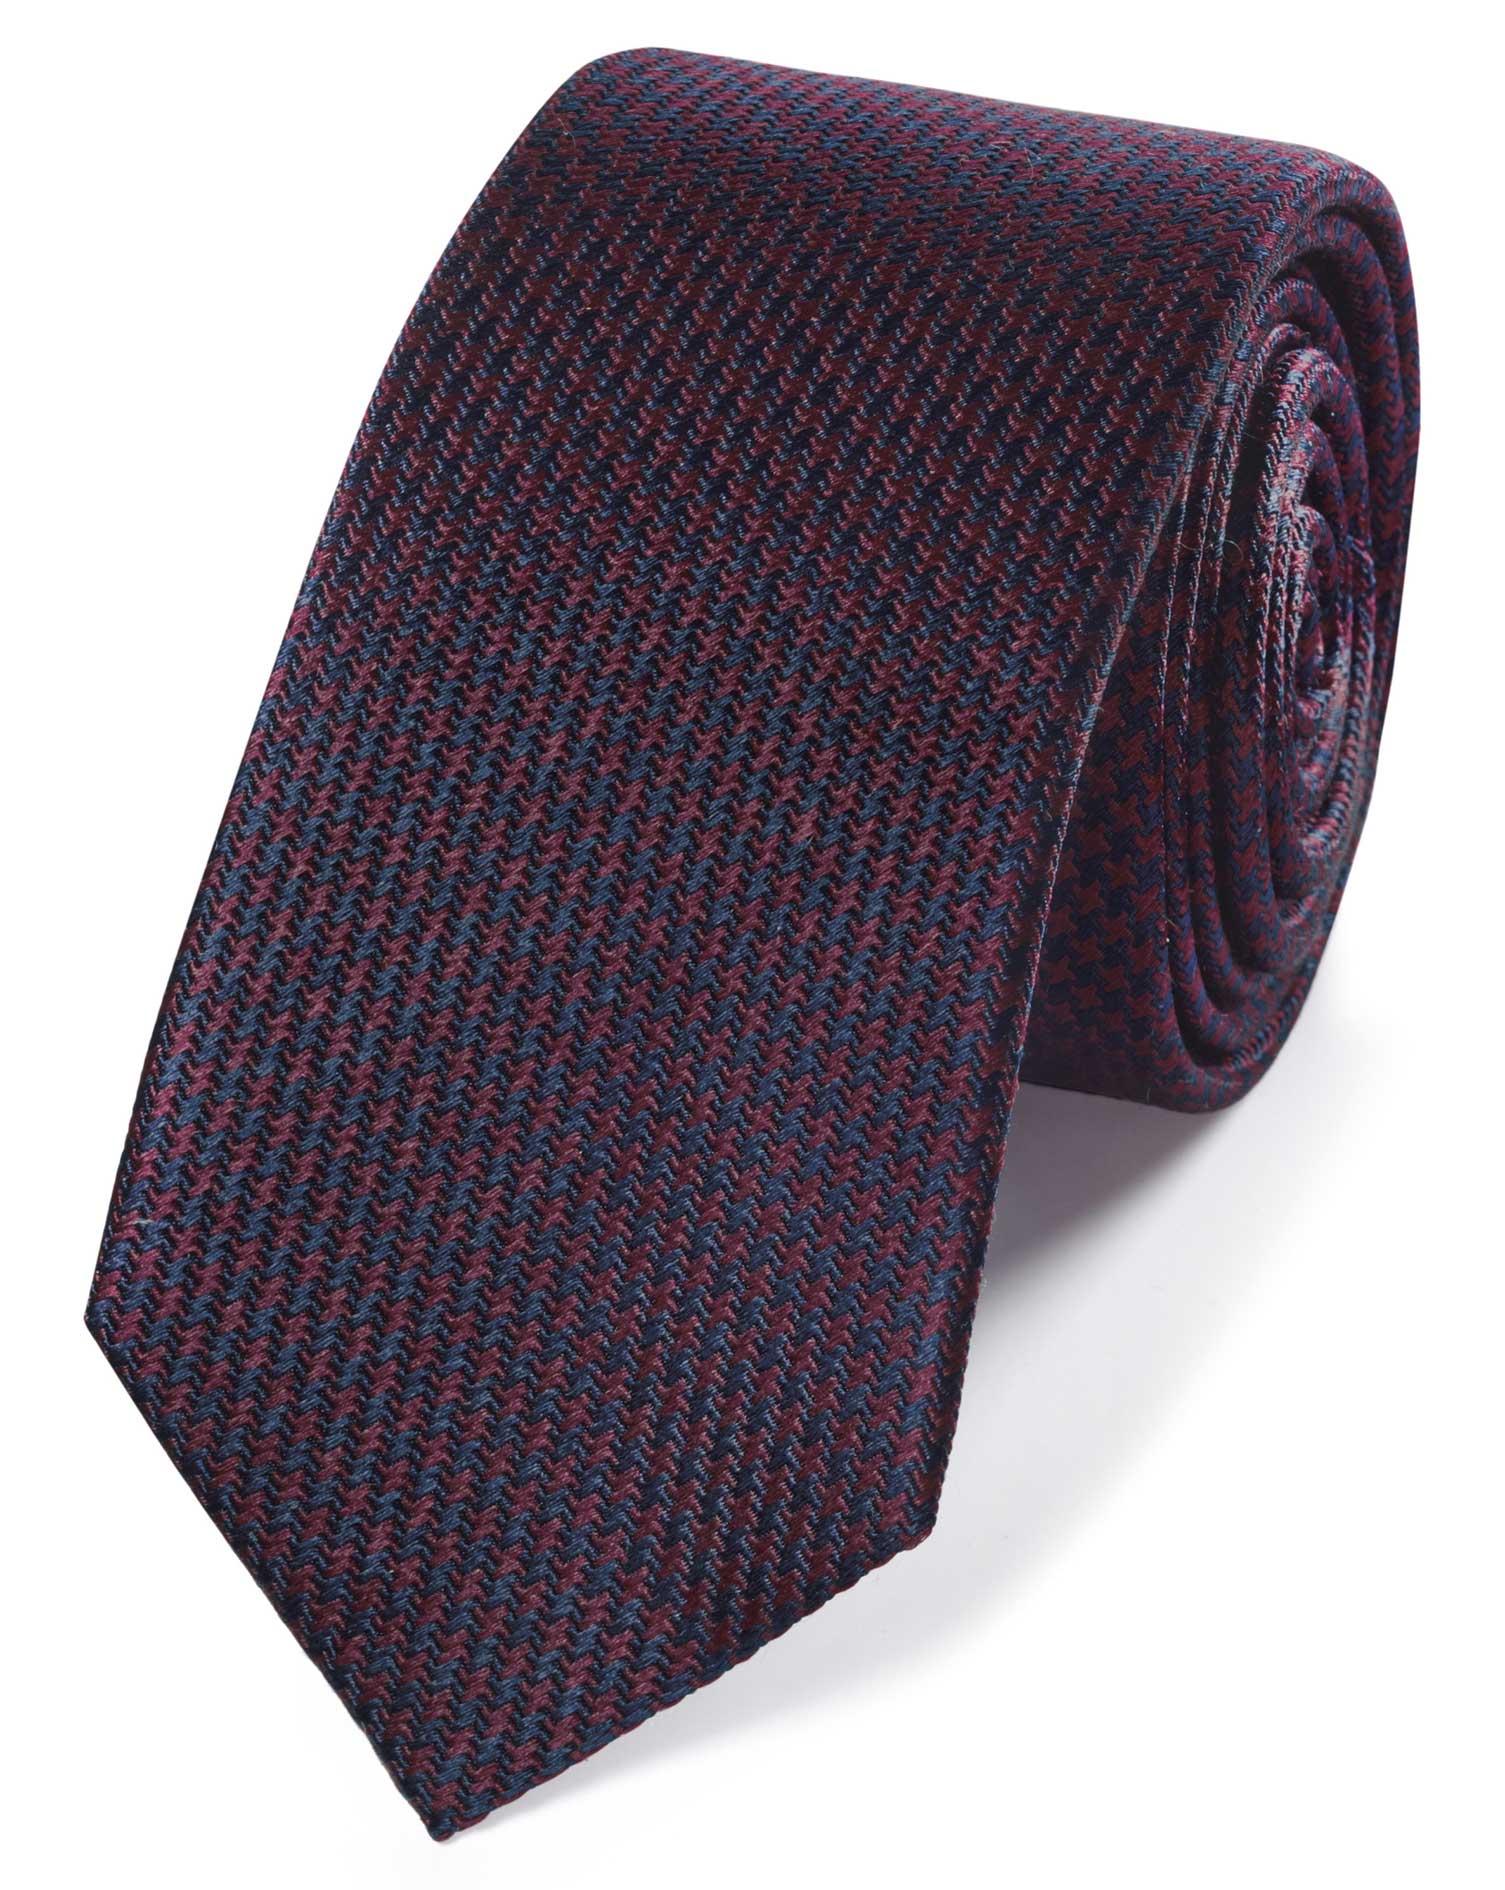 Burgundy and Navy Mini Puppytooth Slim Silk Tie Size OSFA by Charles Tyrwhitt